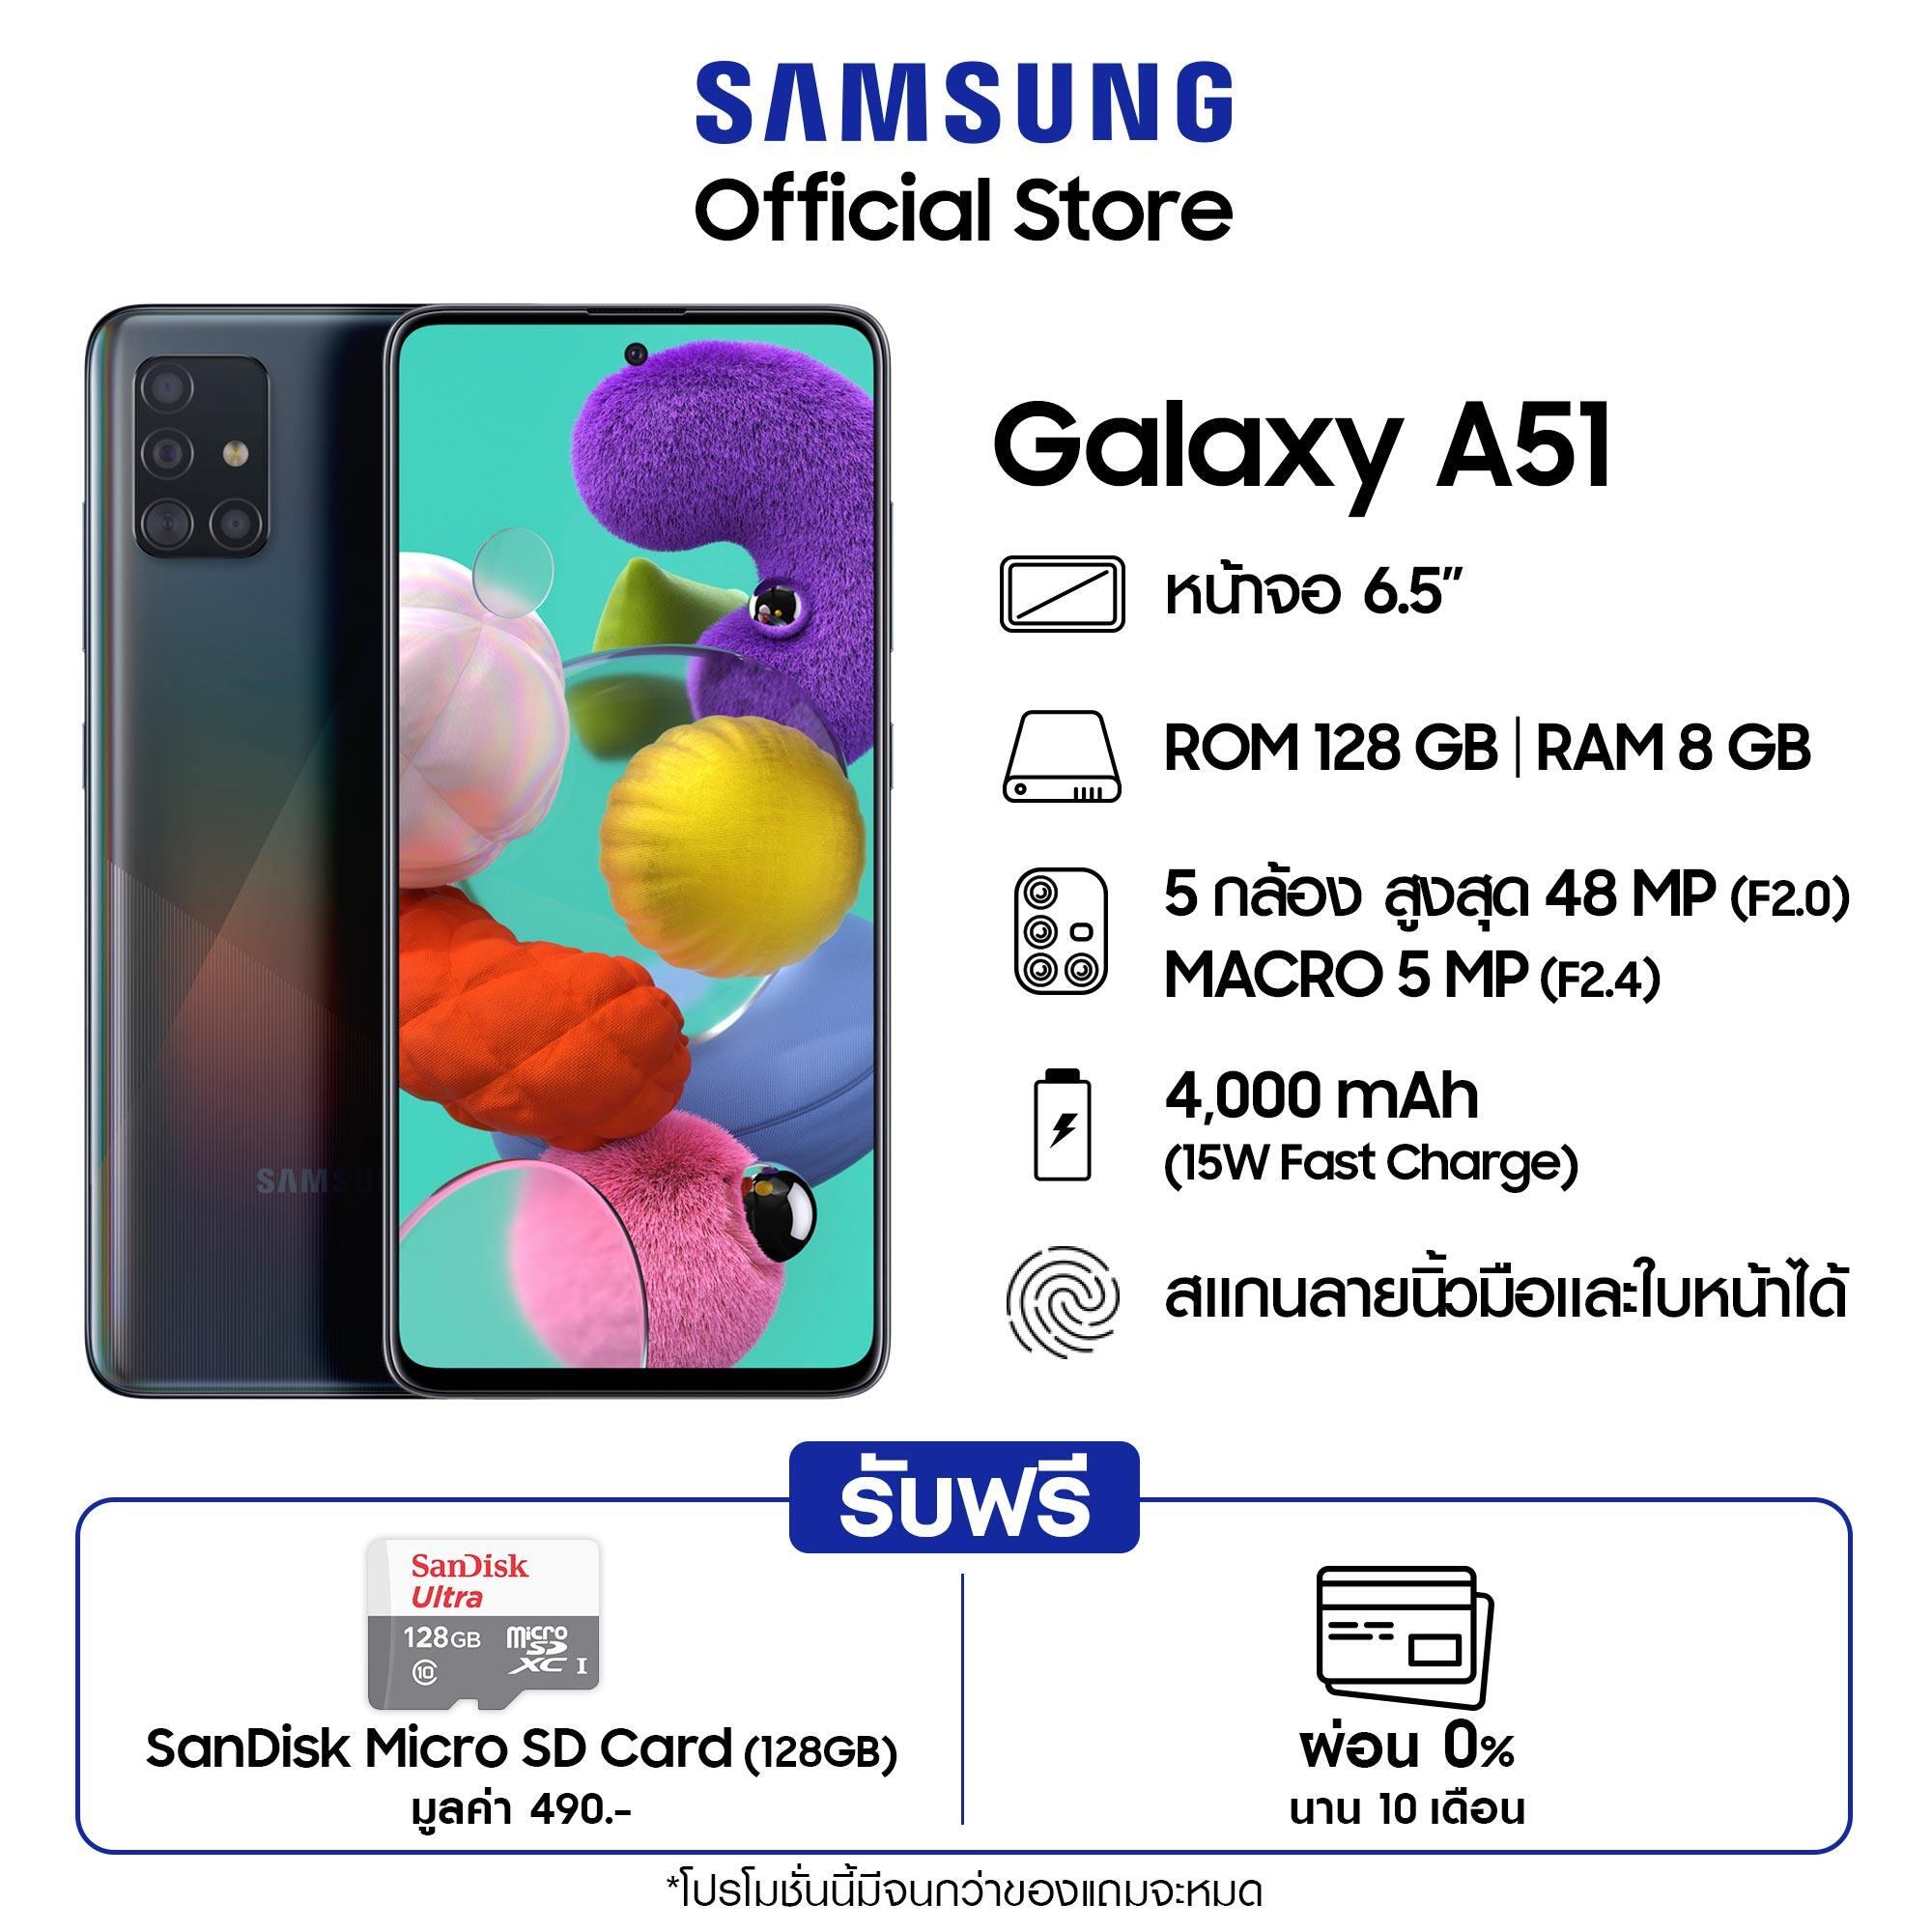 Samsung Galaxy A51 (8/128GB) แถมฟรี SD card 128 GB มูลค่า 490 บาท (โทรศัพท์มือถือ)